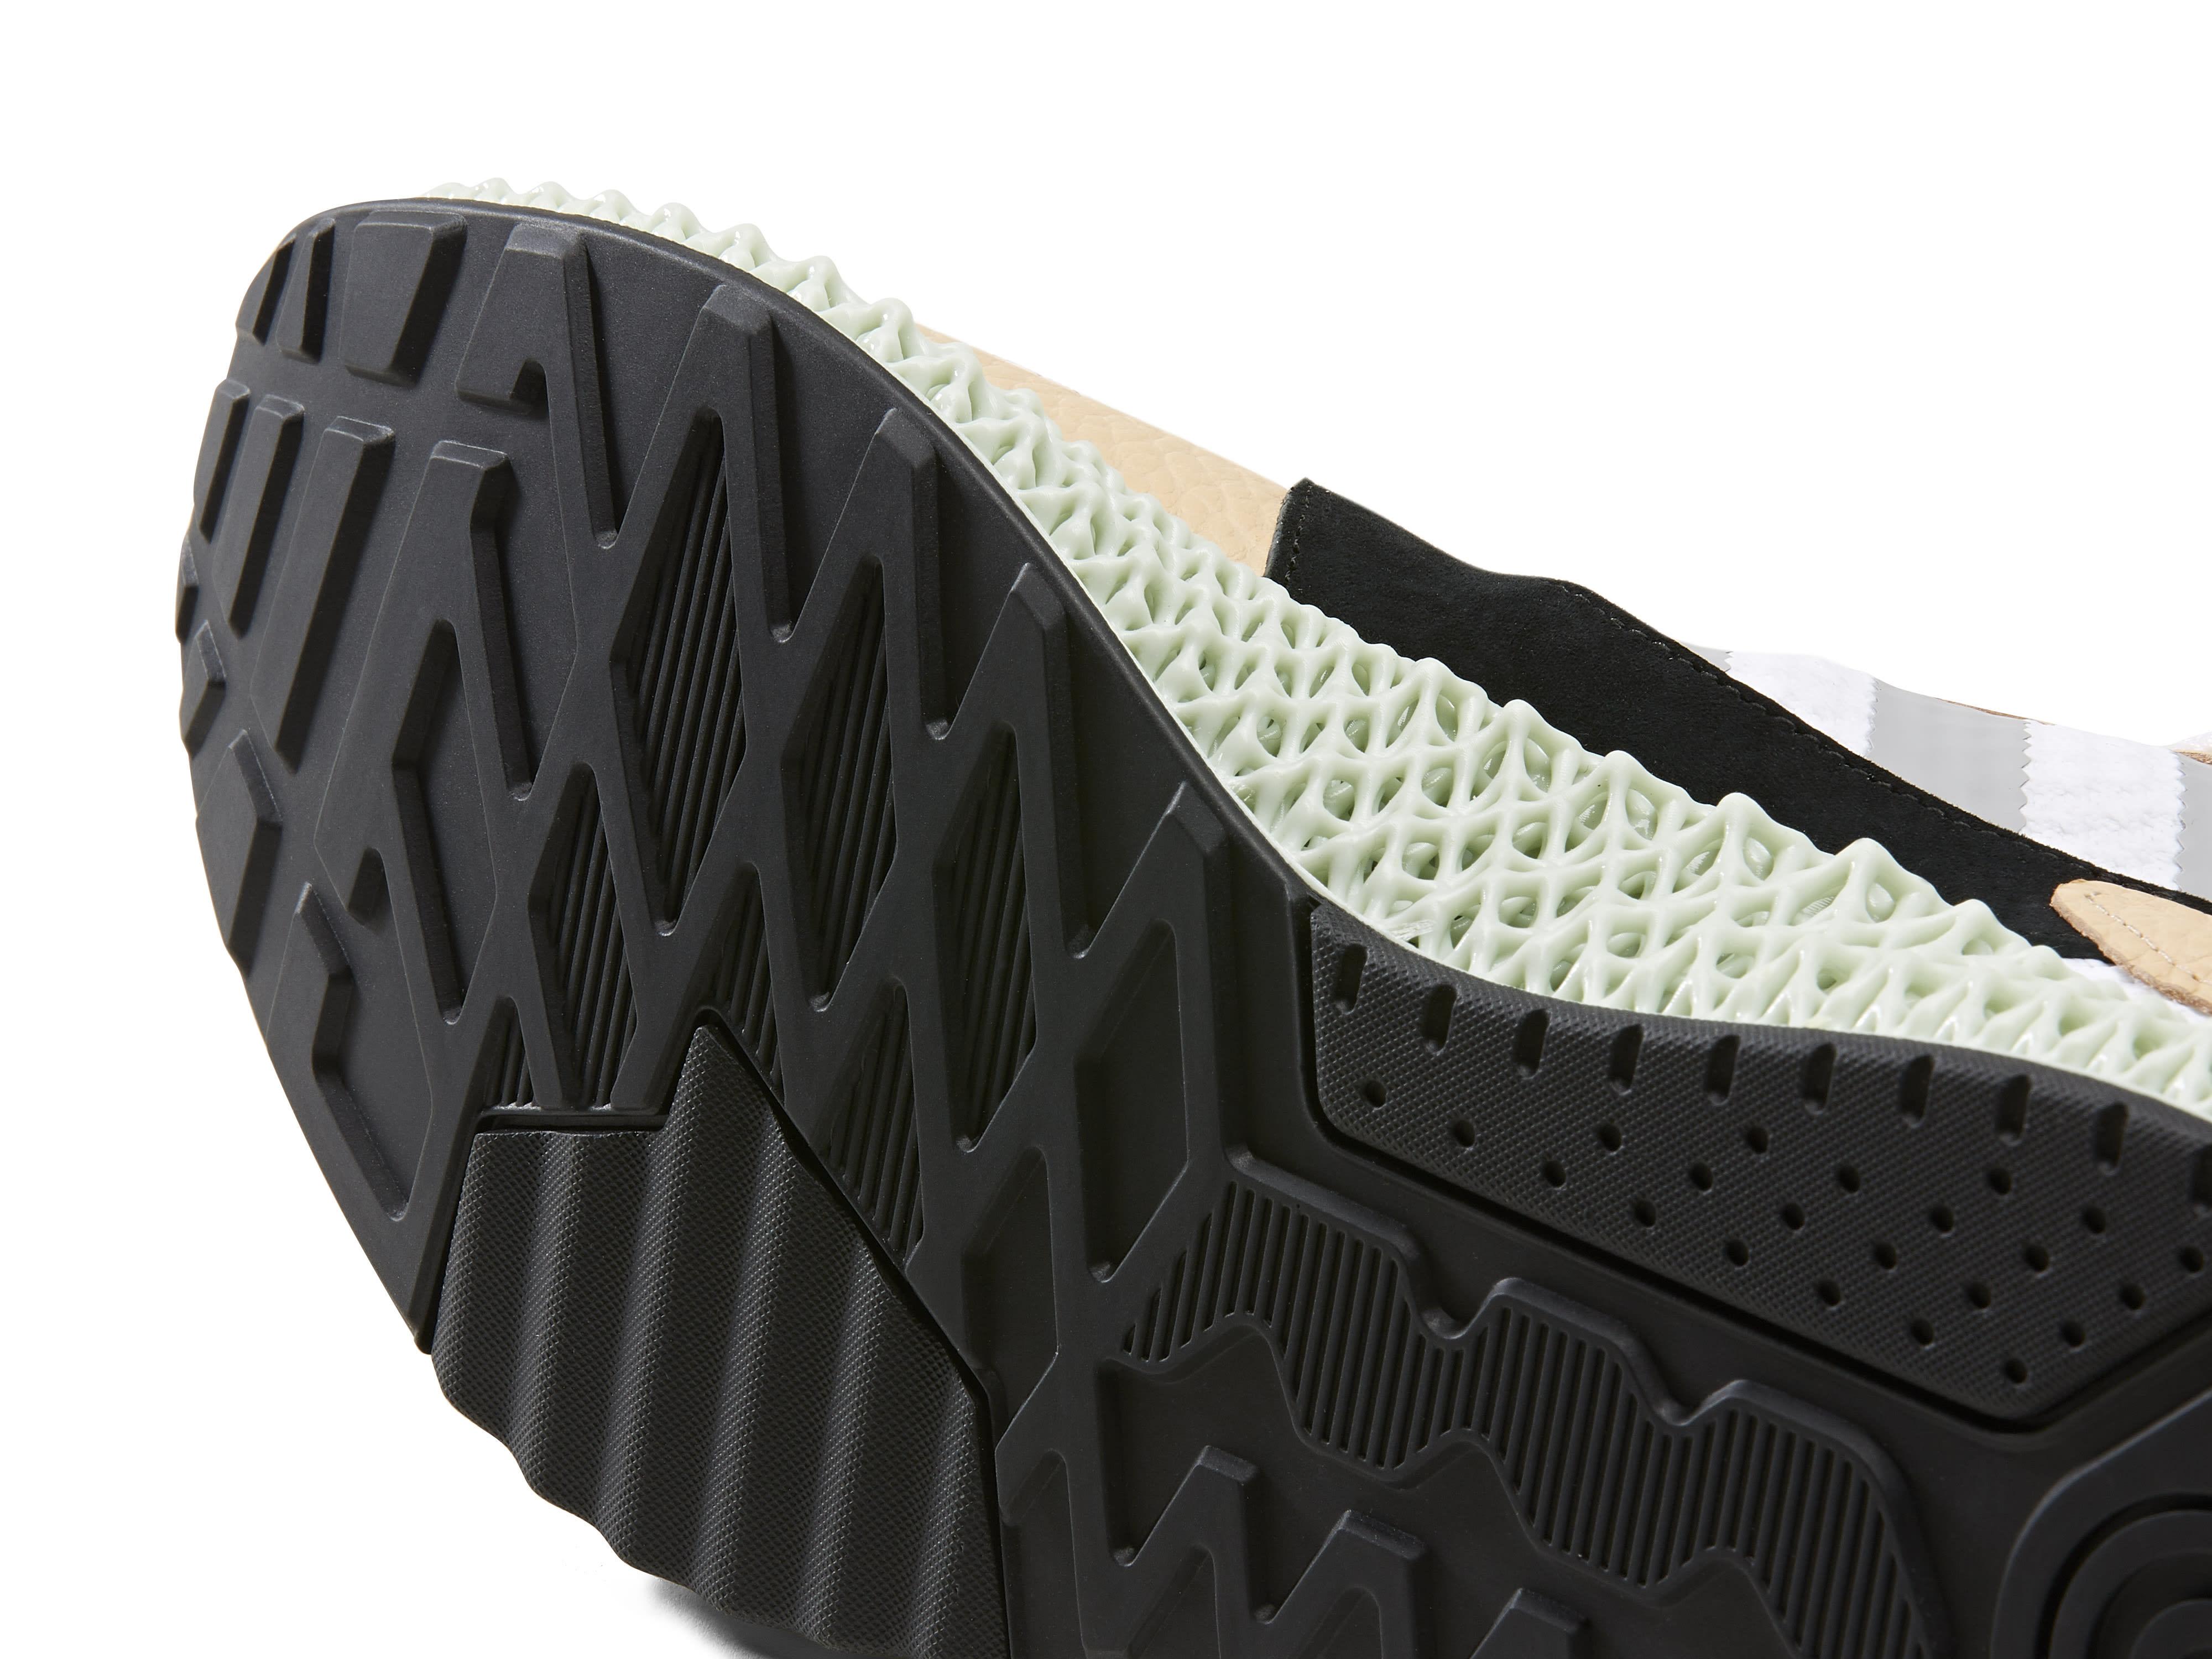 Hender Scheme x Adidas ZX 4000 4D F36048 (Outsole)